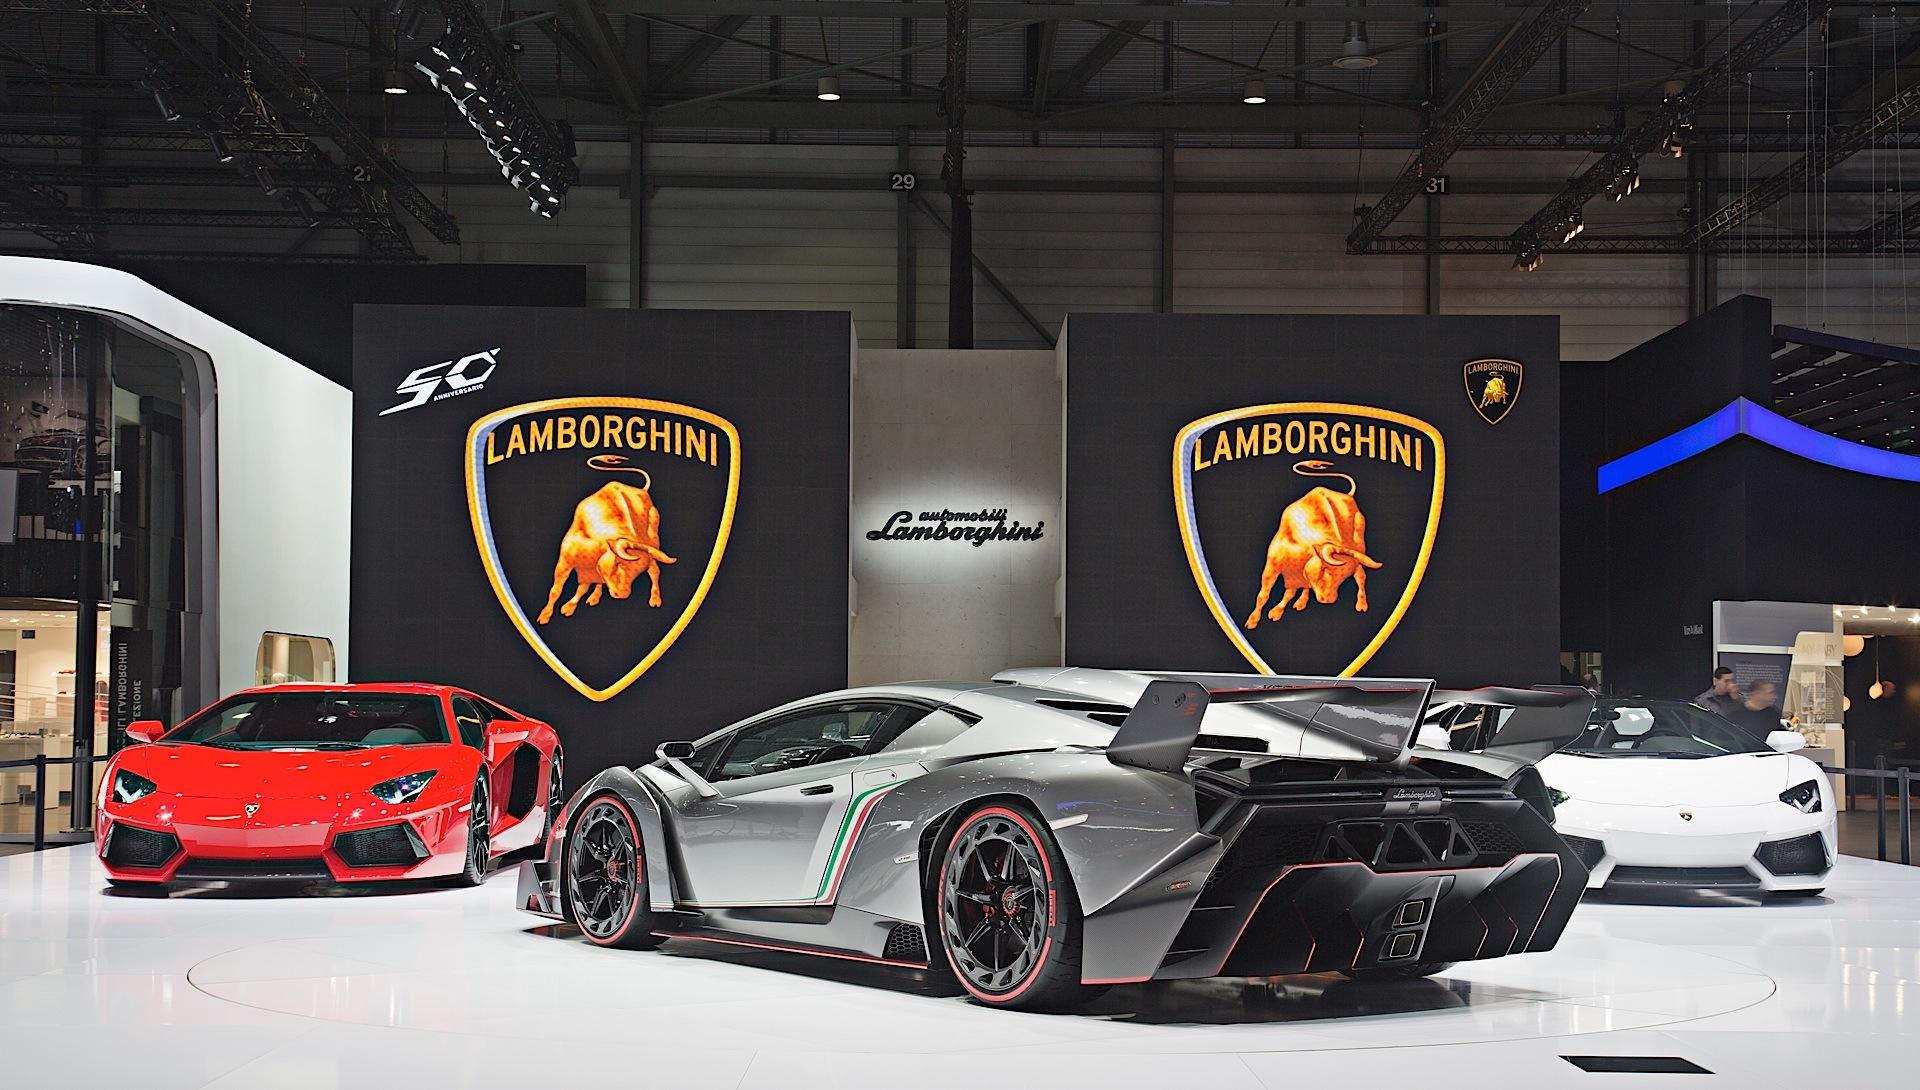 Lamborghini Veneno Specs Amp Photos 2013 2014 2015 2016 2017 2018 2019 Autoevolution